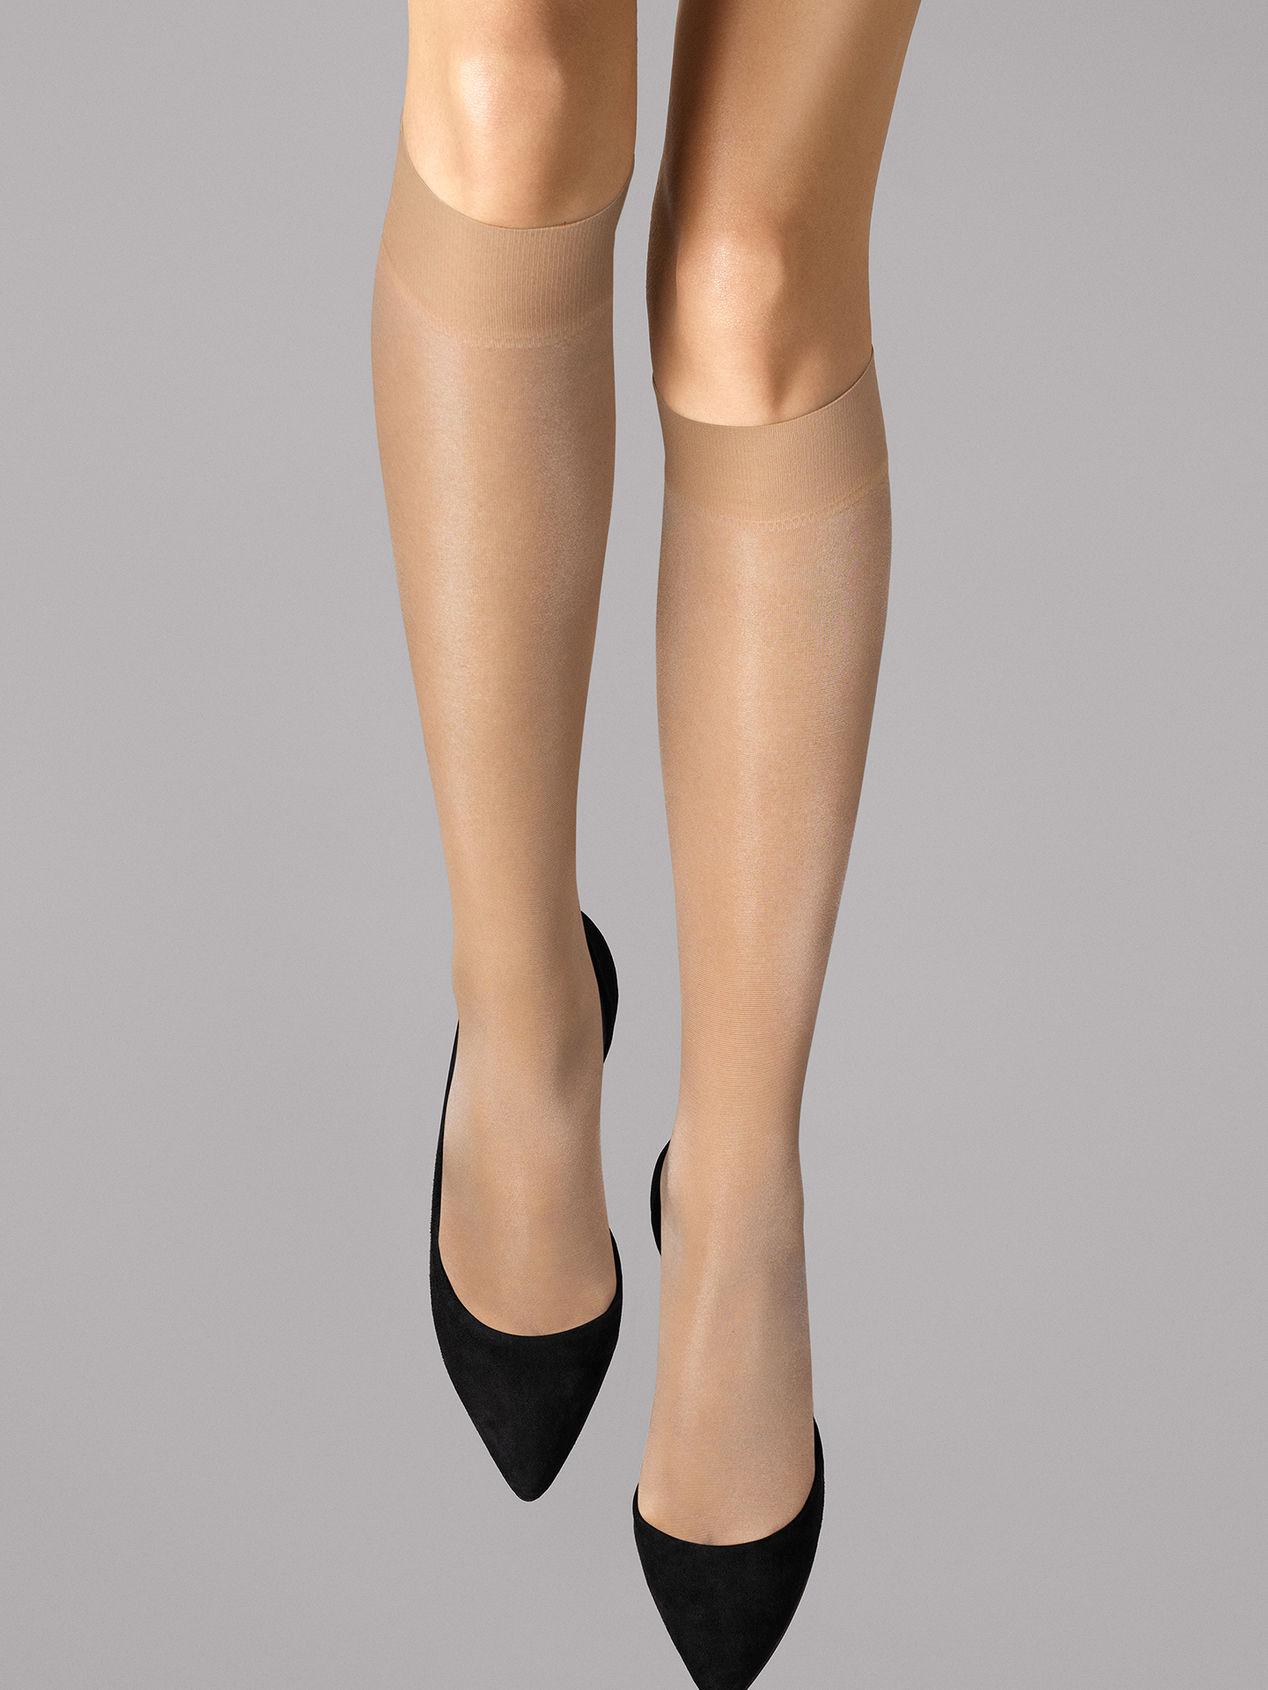 Wolford Satin Touch 20 Knee-Highs, fairly light, medium